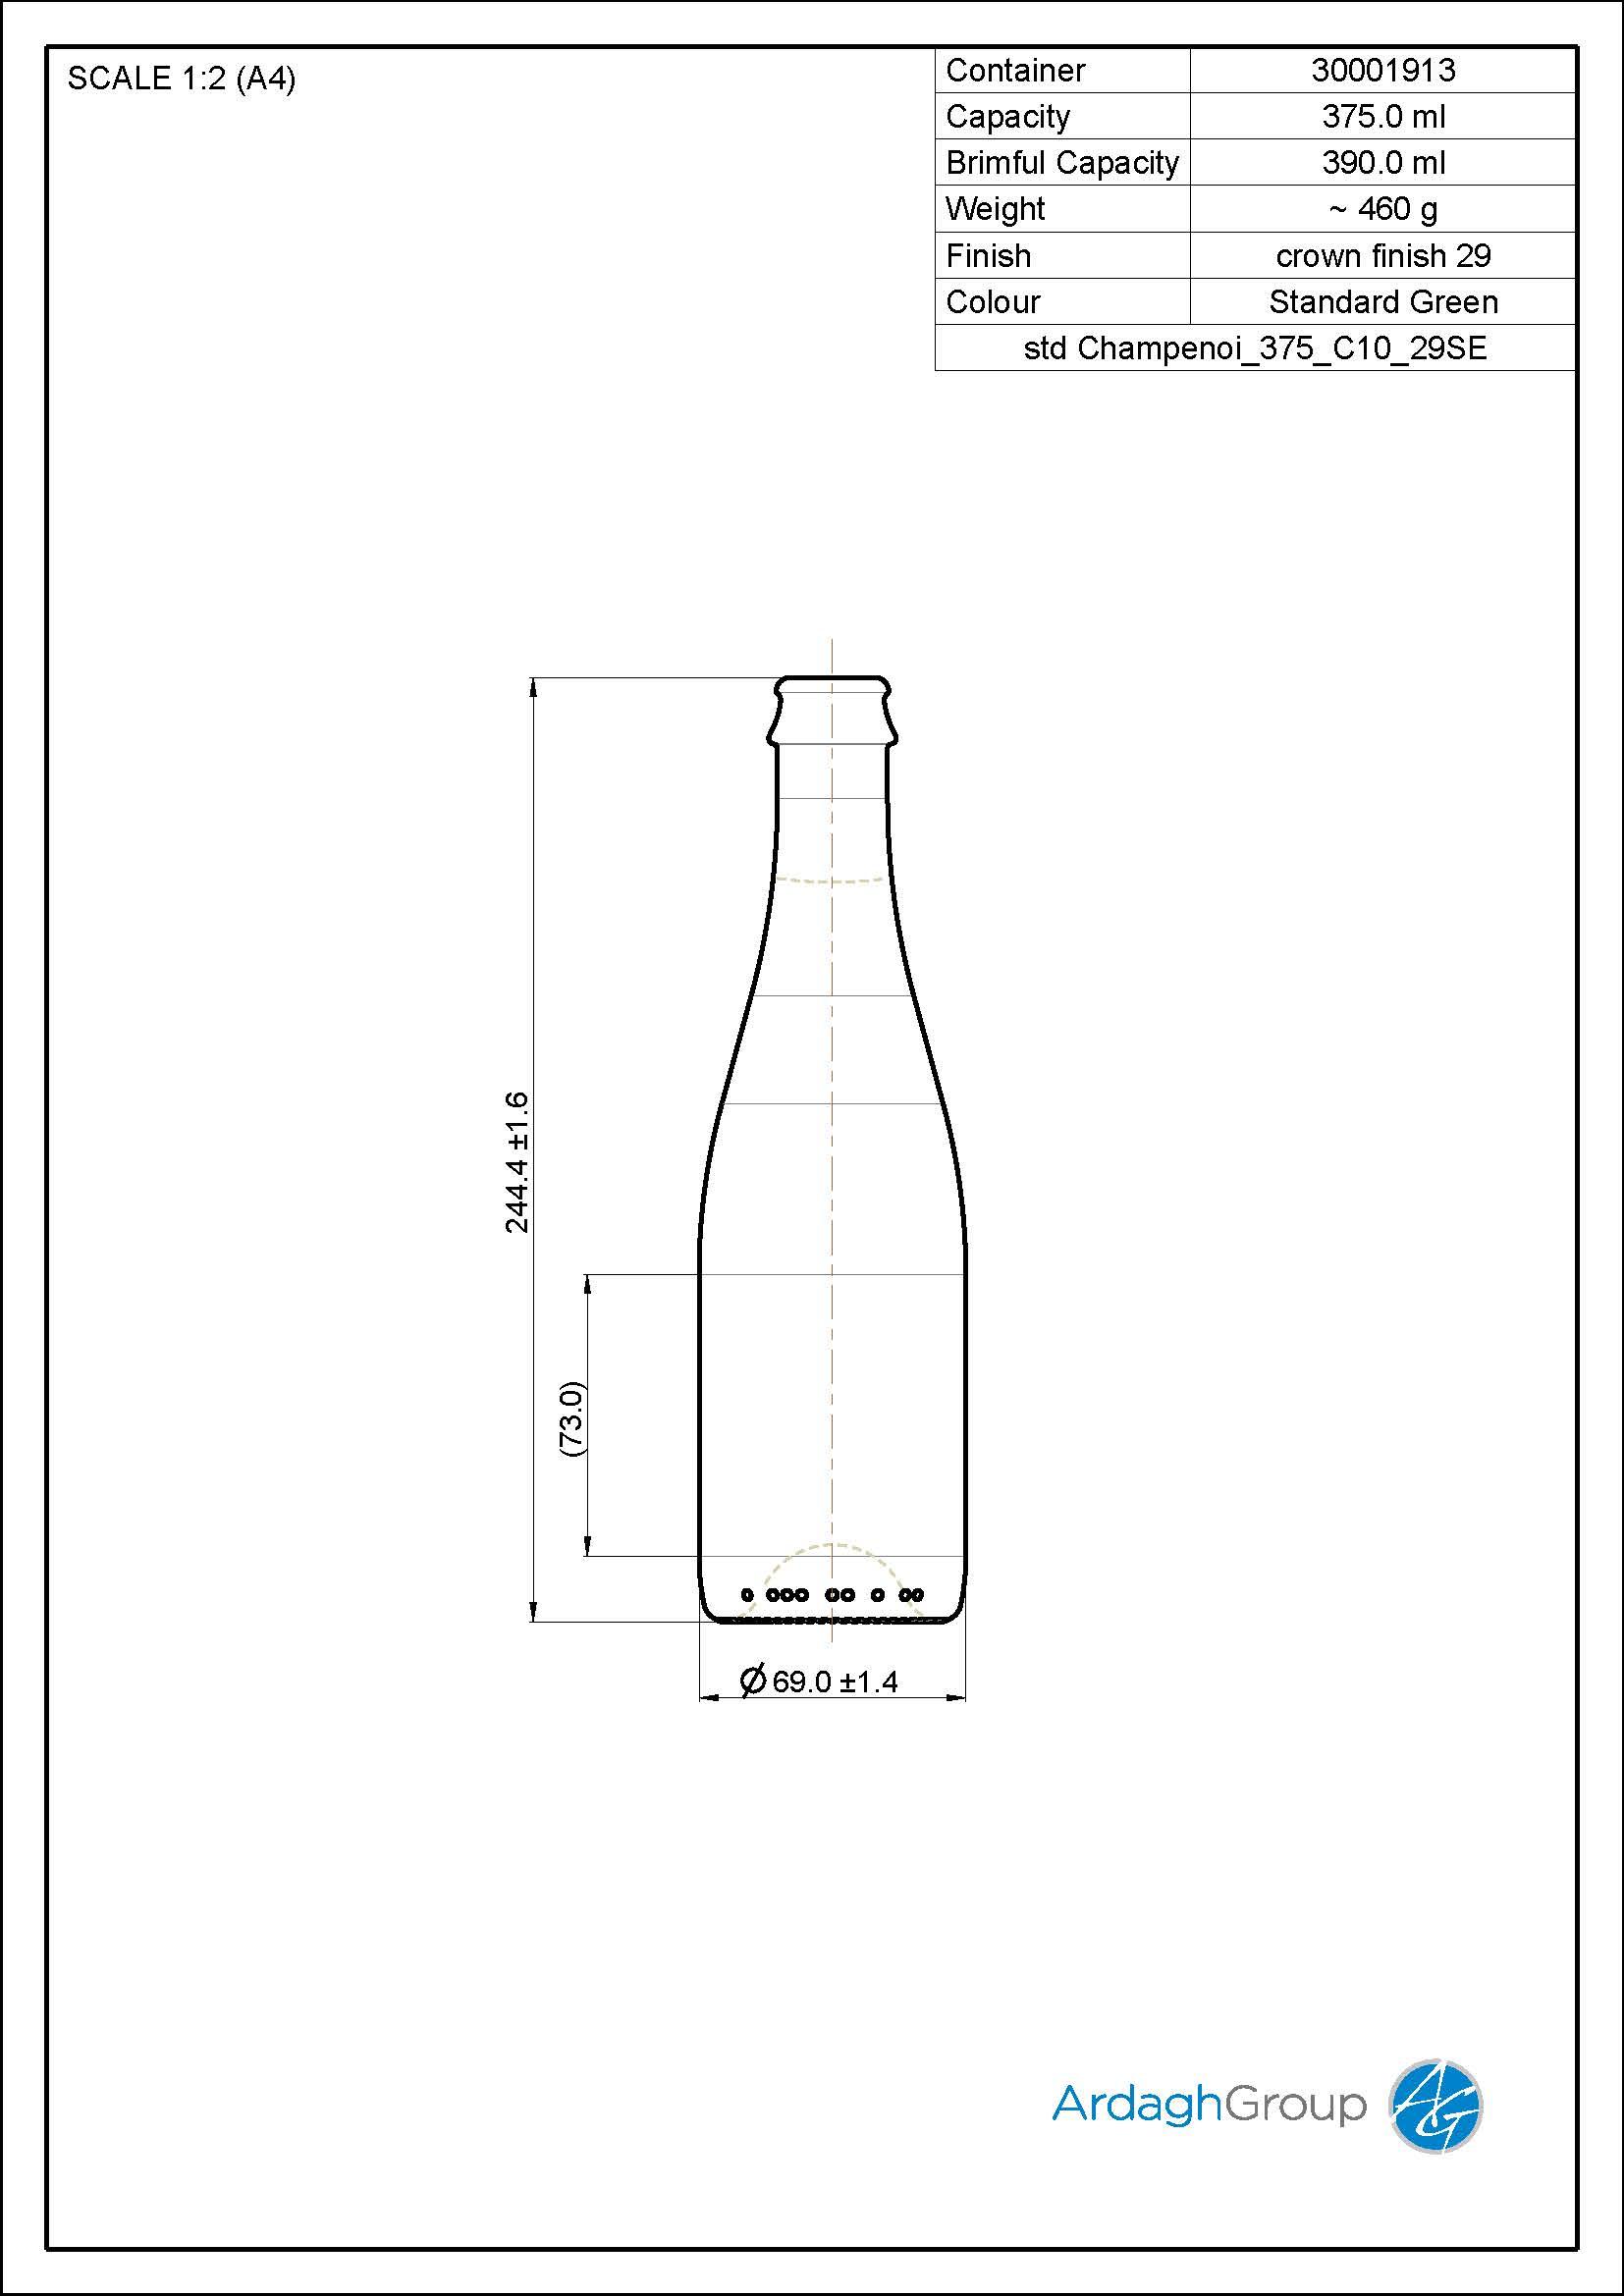 std Champenoi 375 C10 29SE